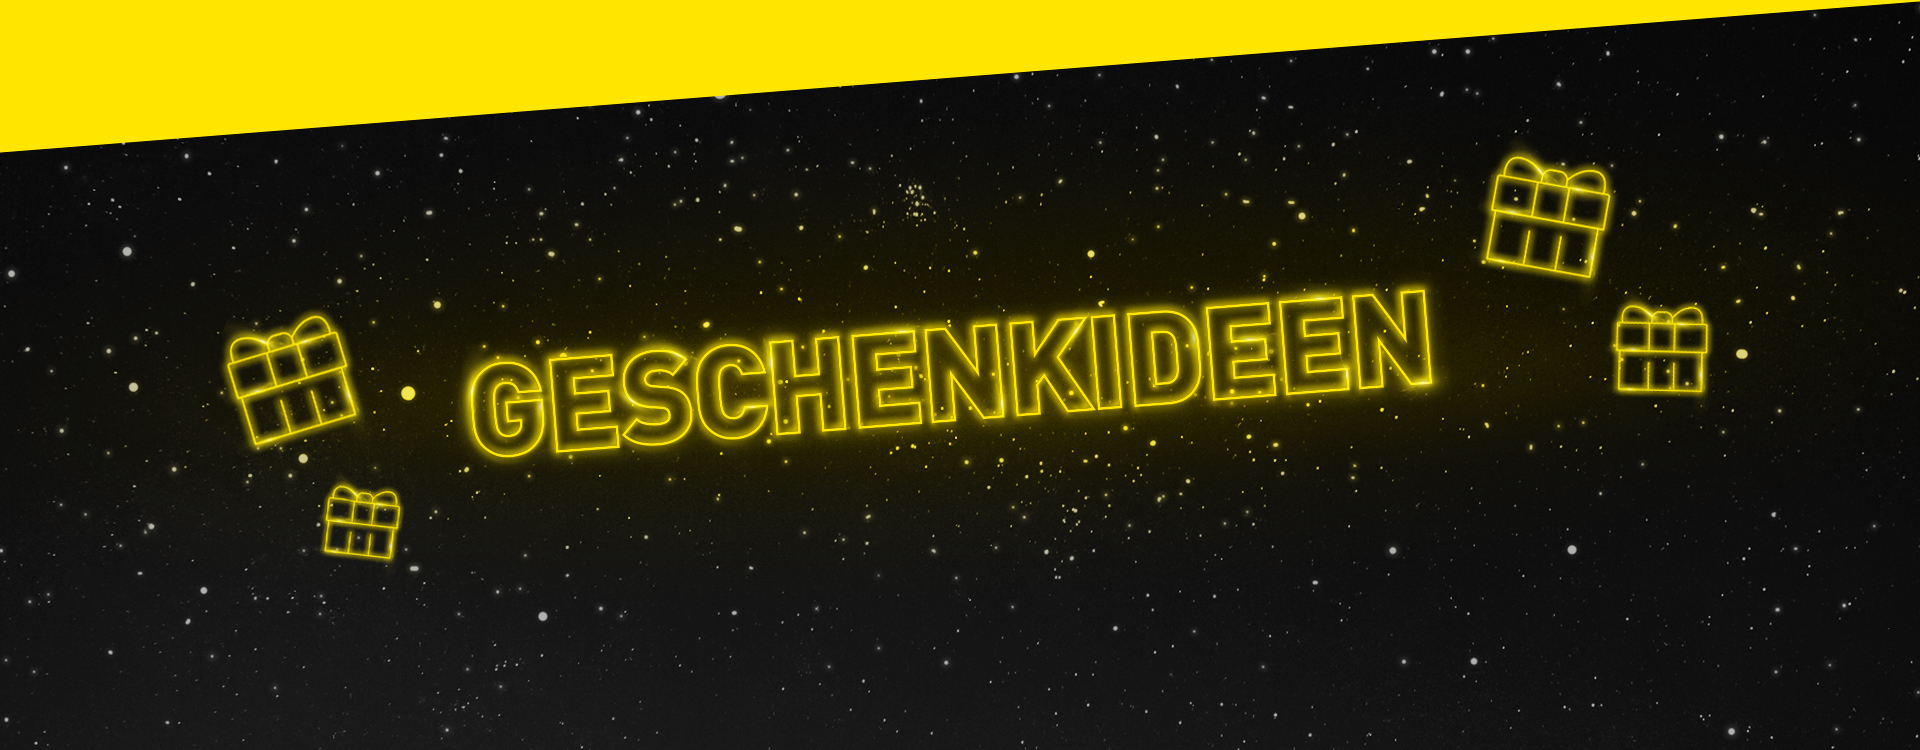 Geschenkideen_Onlineshop-Kategorieb-hnen-Desktop-1920x750px